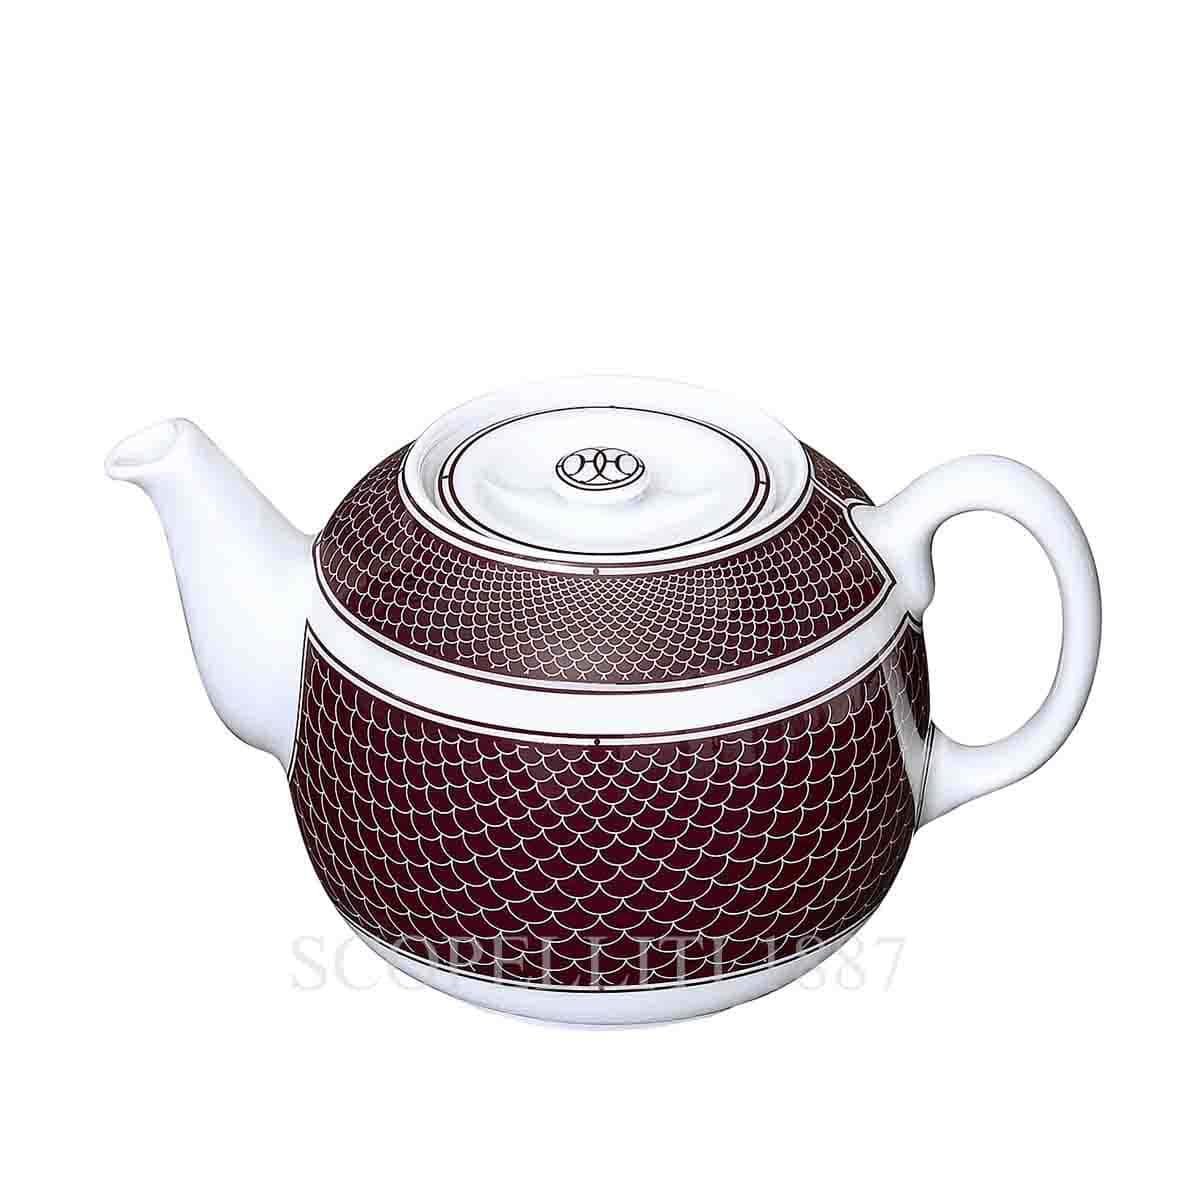 Hermes H Deco Red Teapot 2 Persons Scopelliti 1887